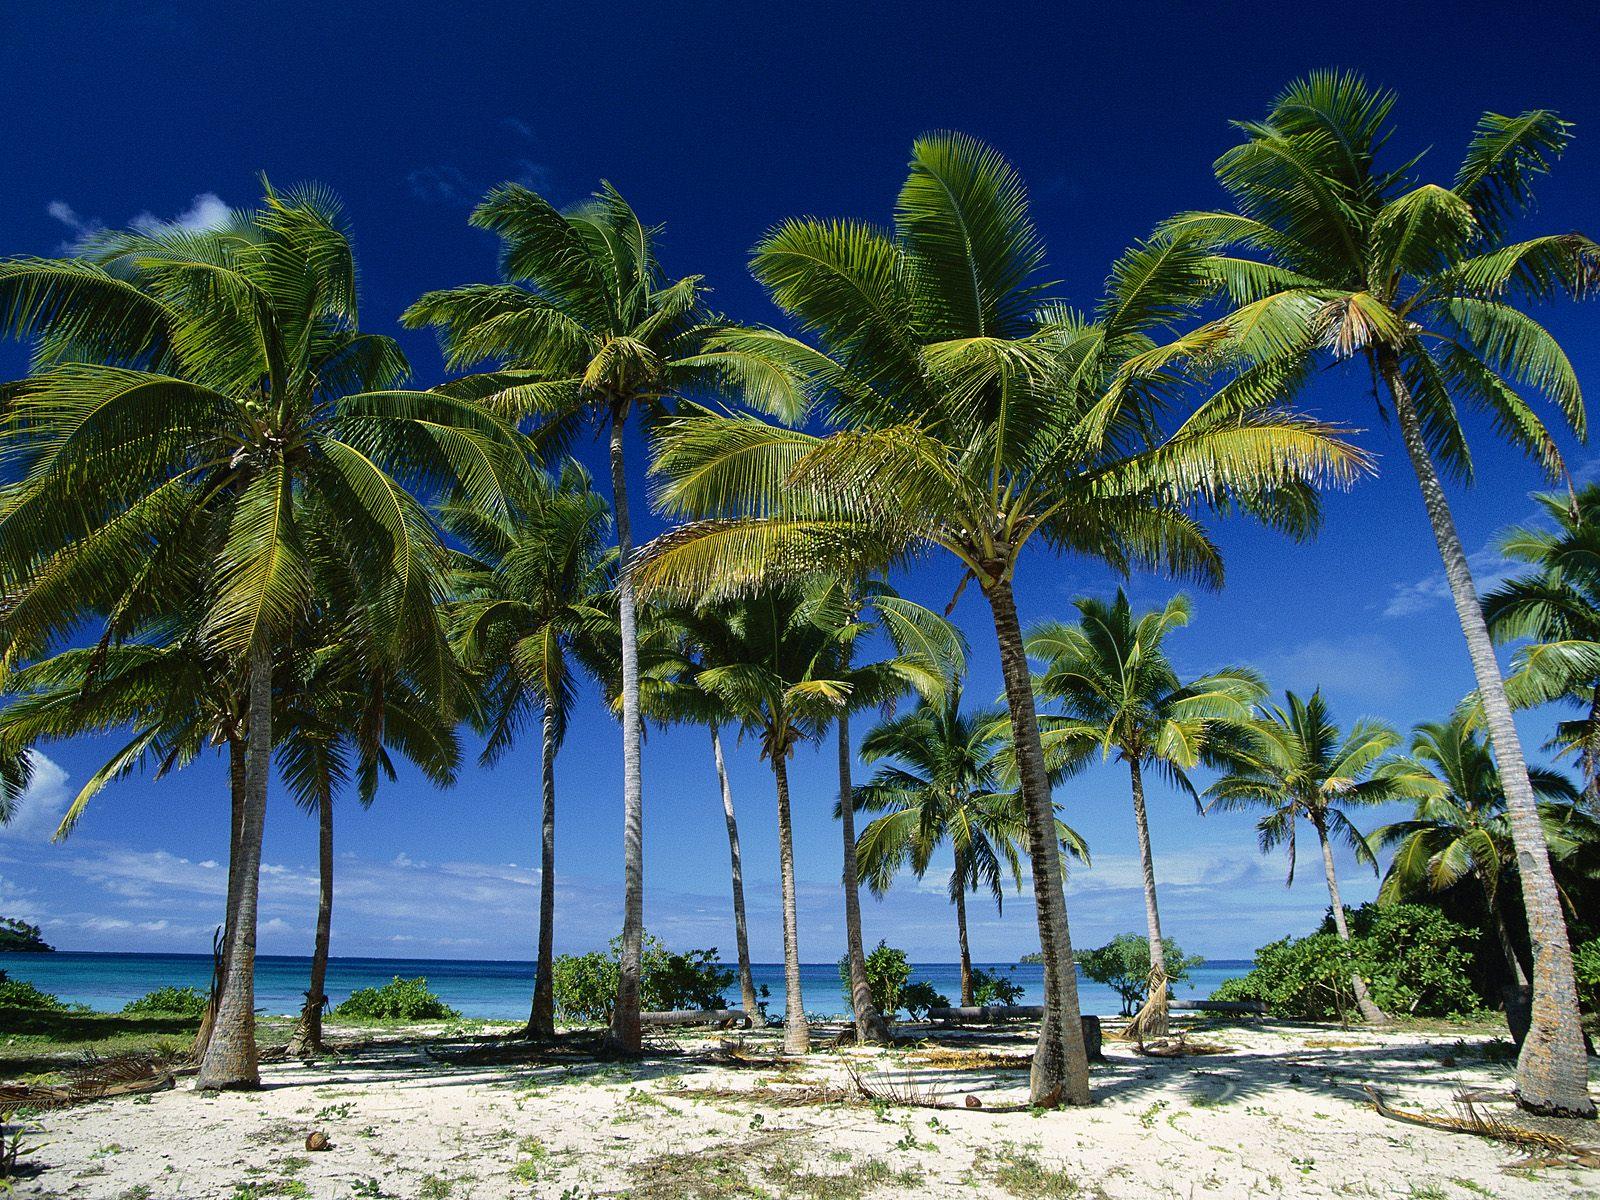 Coconut_Palms_Taunga_Island_Vava'u_Island_Group_Tonga.jpg